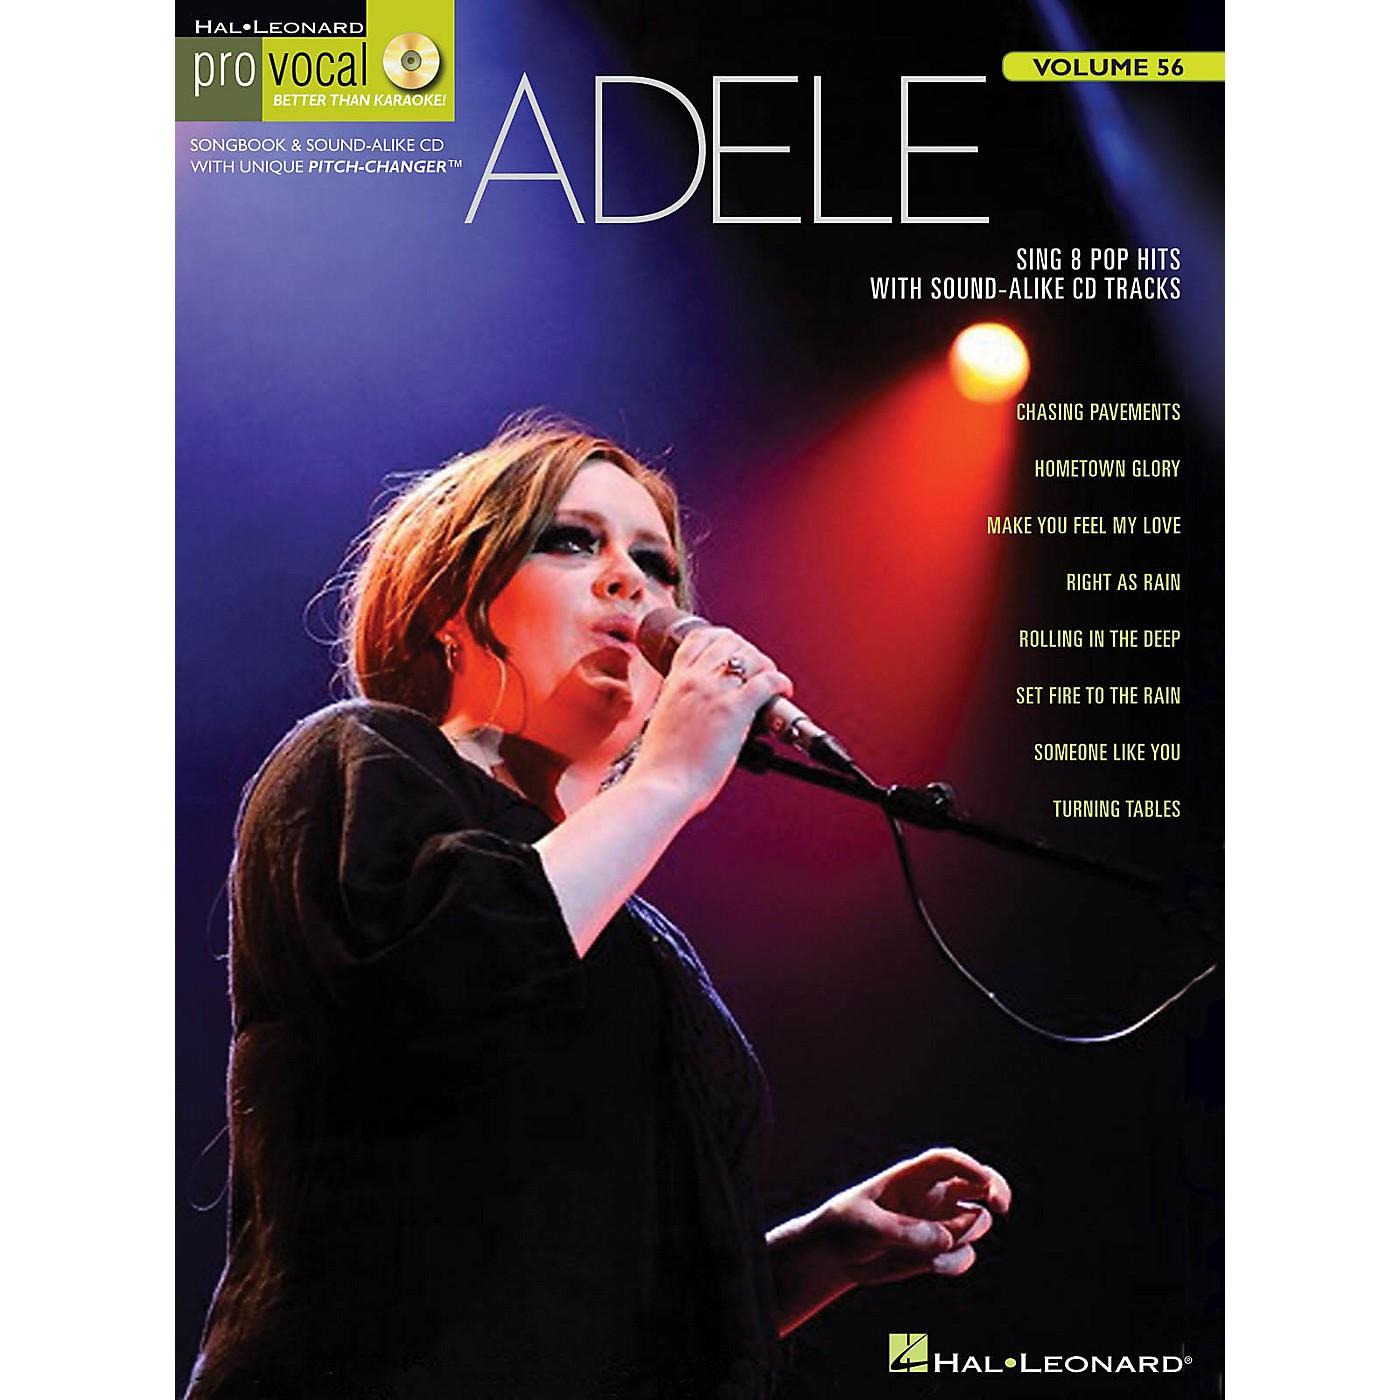 Hal Leonard Adele Pro Vocal Women's Edition Volume 56 Songbook/CD thumbnail